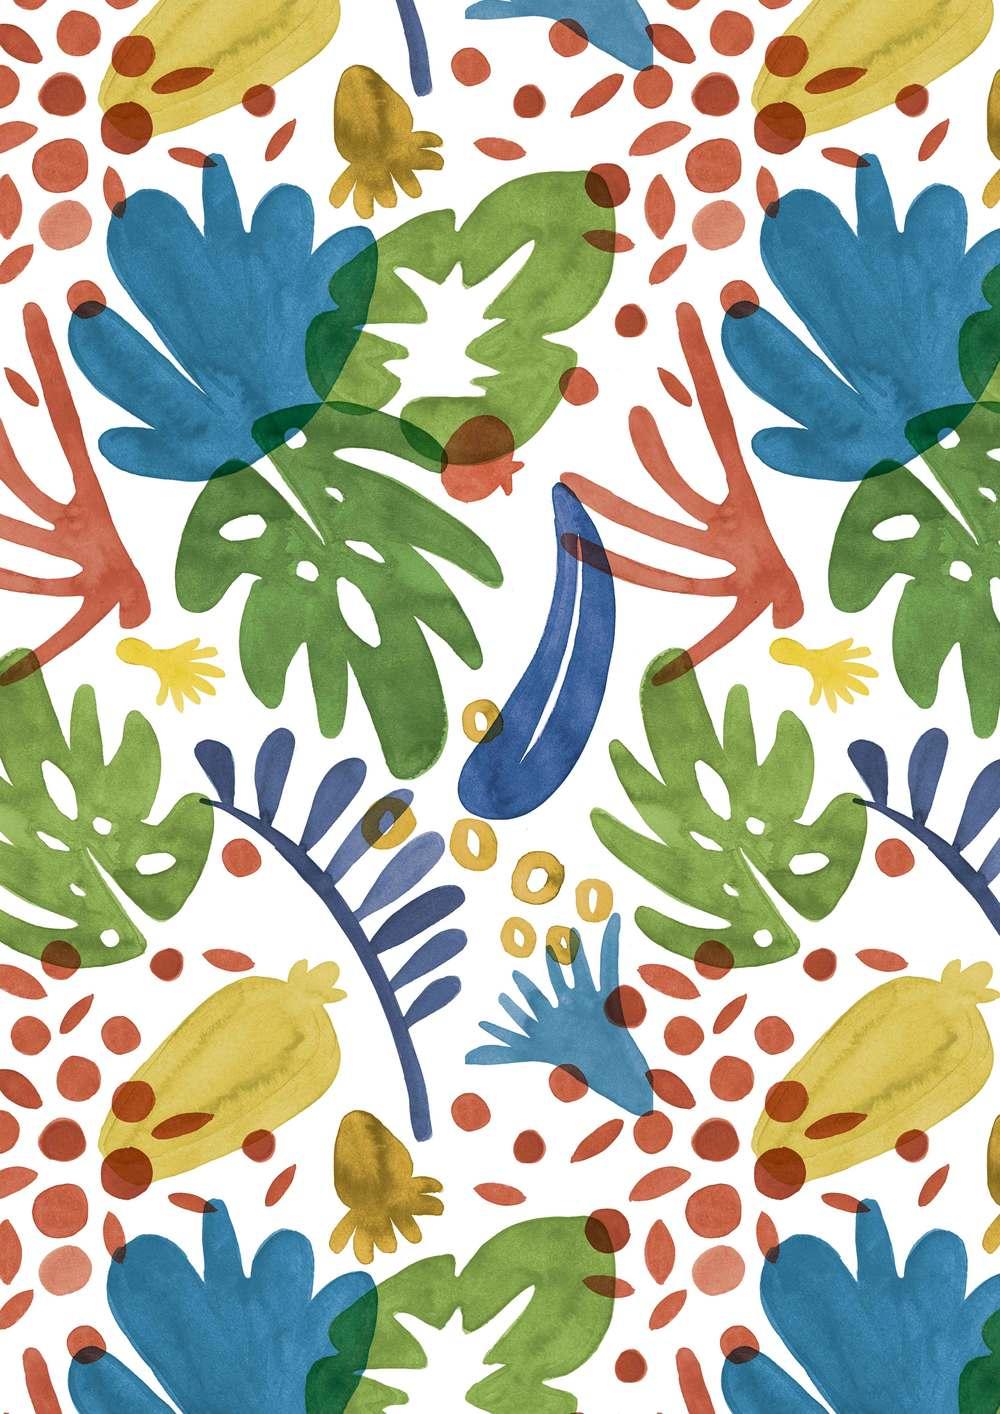 Botanical Gardens - Personal Work (2015)